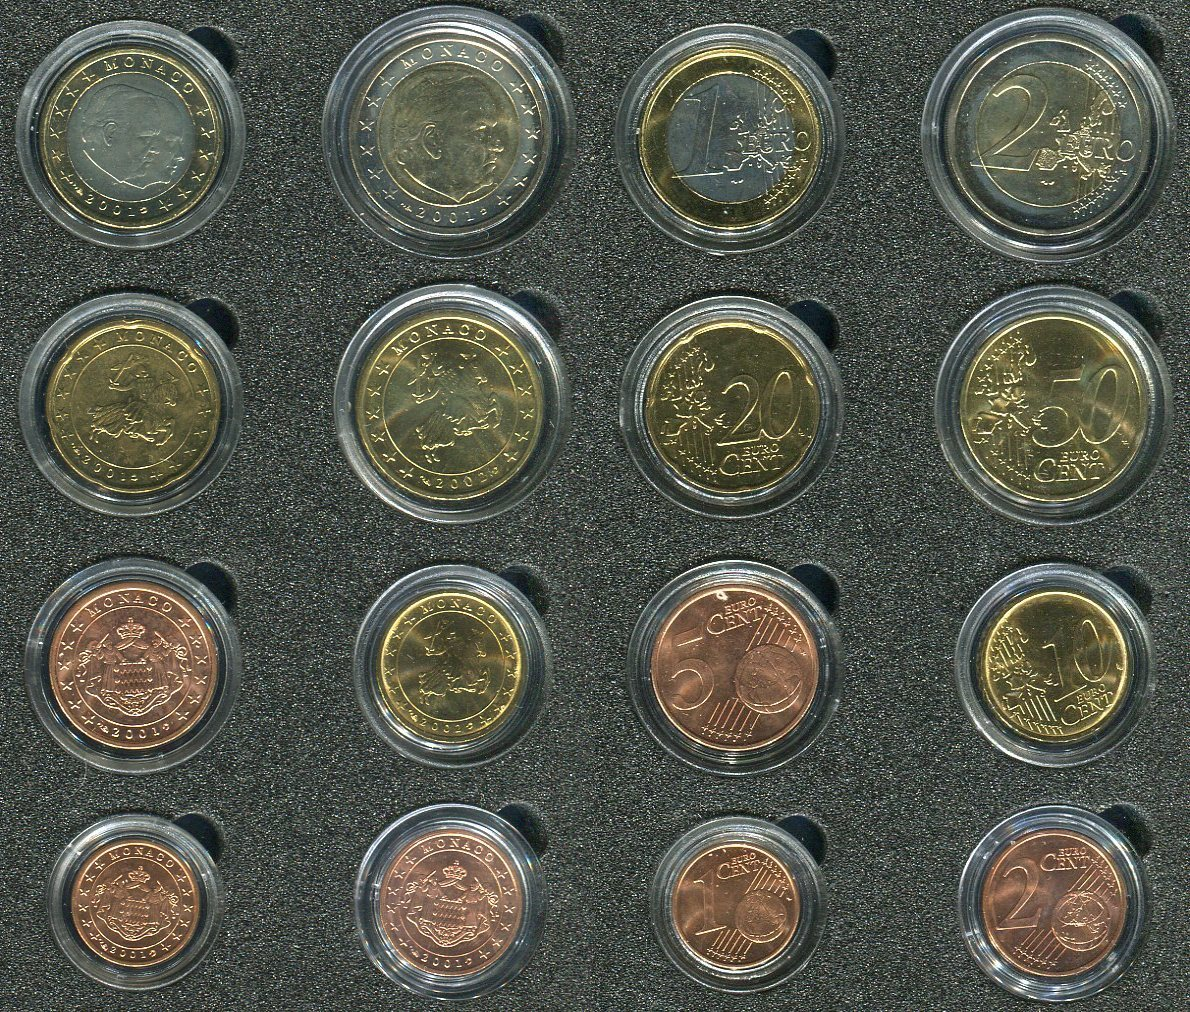 Kursmünzensatz 1 Cent Bis 2 Euro 20012002 Monaco Kms 8 Münzen Unc